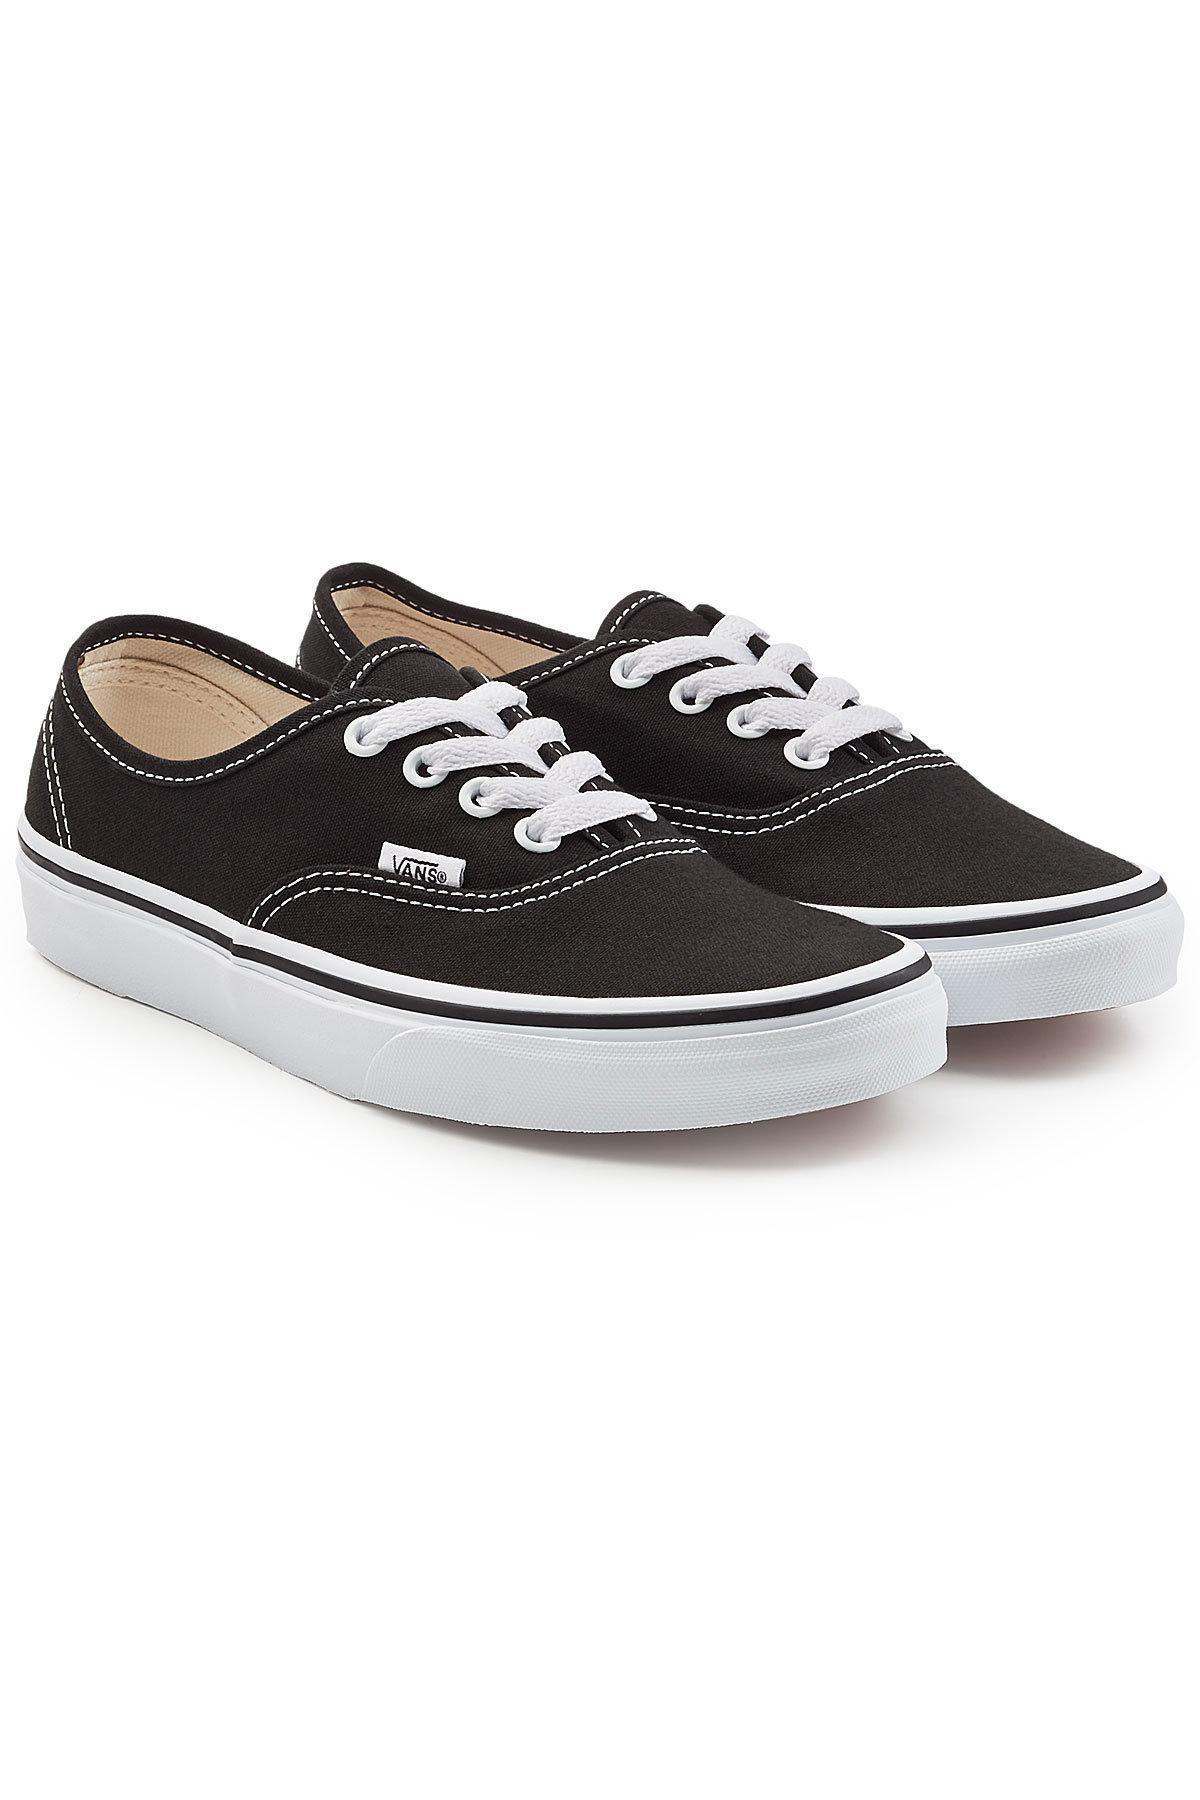 Vans Authentic Sneakers In Black